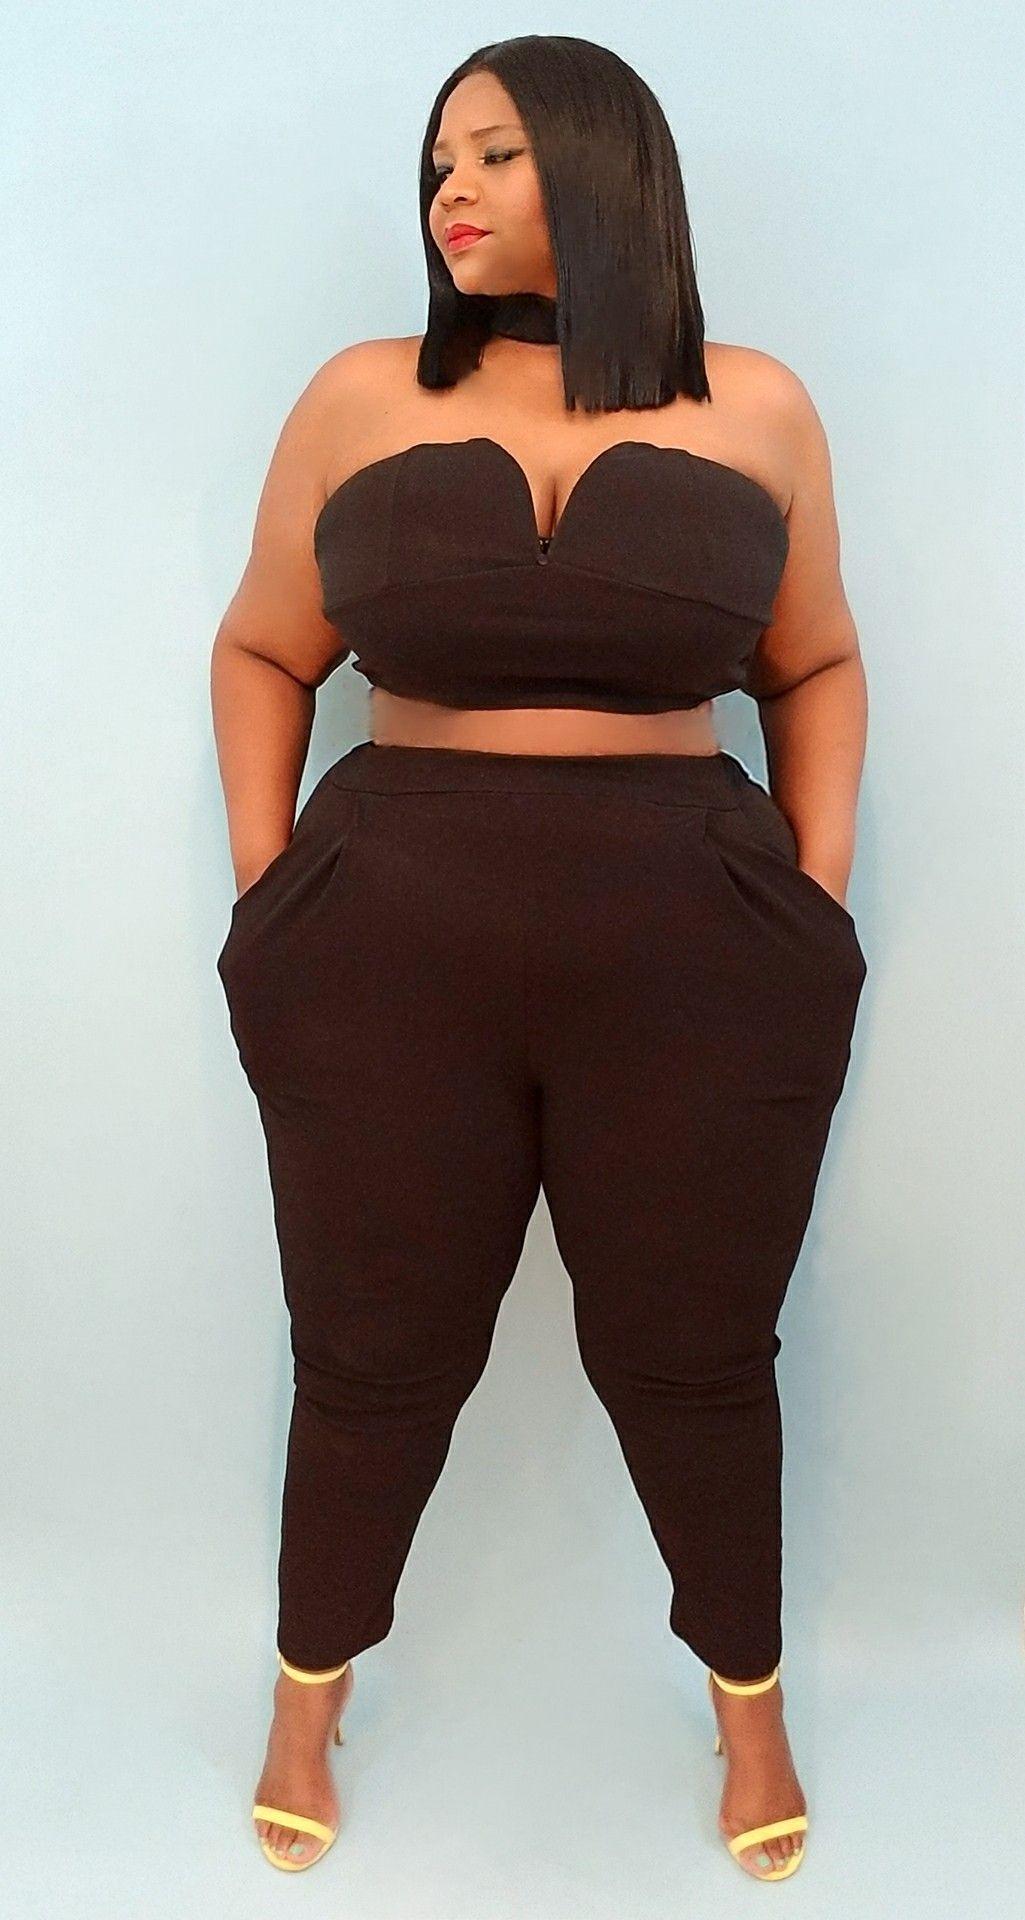 1f25b84cd Plus Size 3 Piece Choker High Waisted Pants Set | BODY POSITIVITY ...